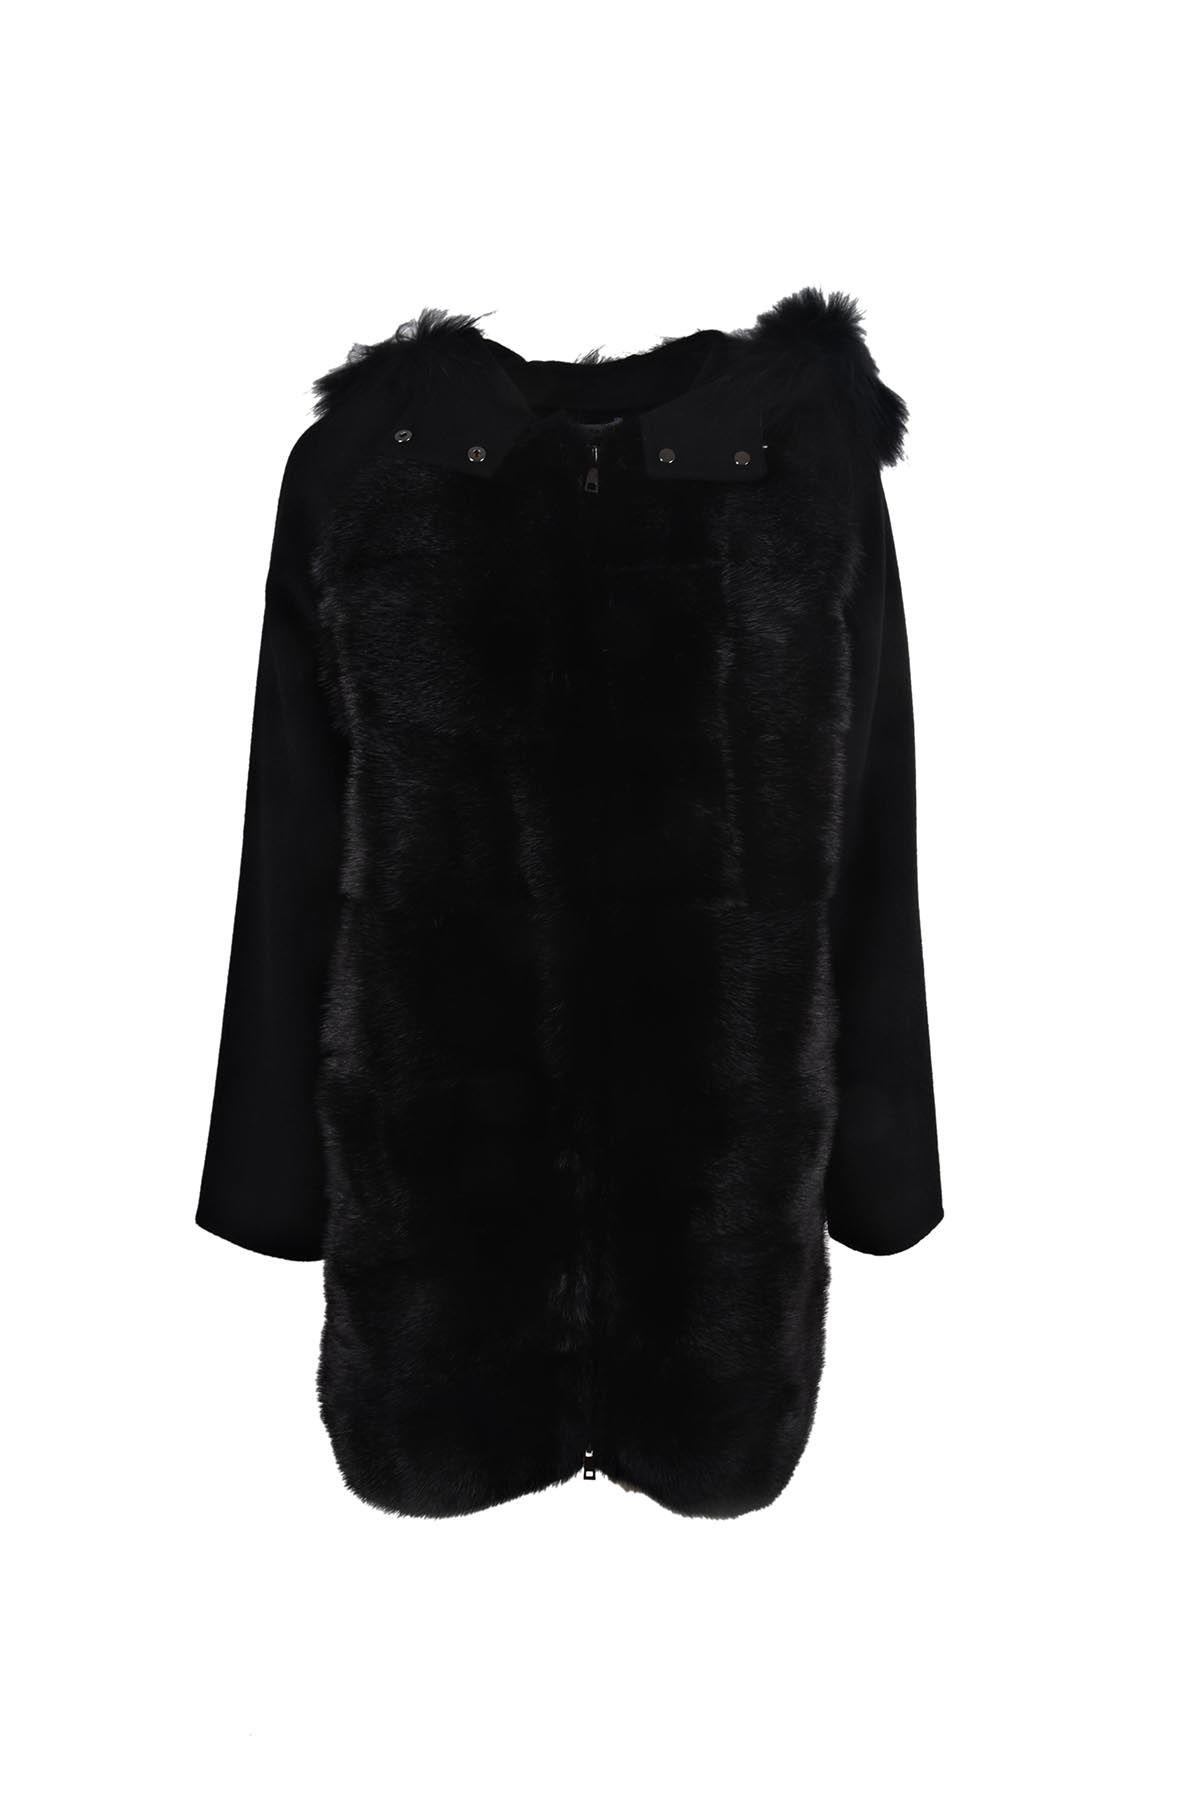 Parosh Furry Linky Coat